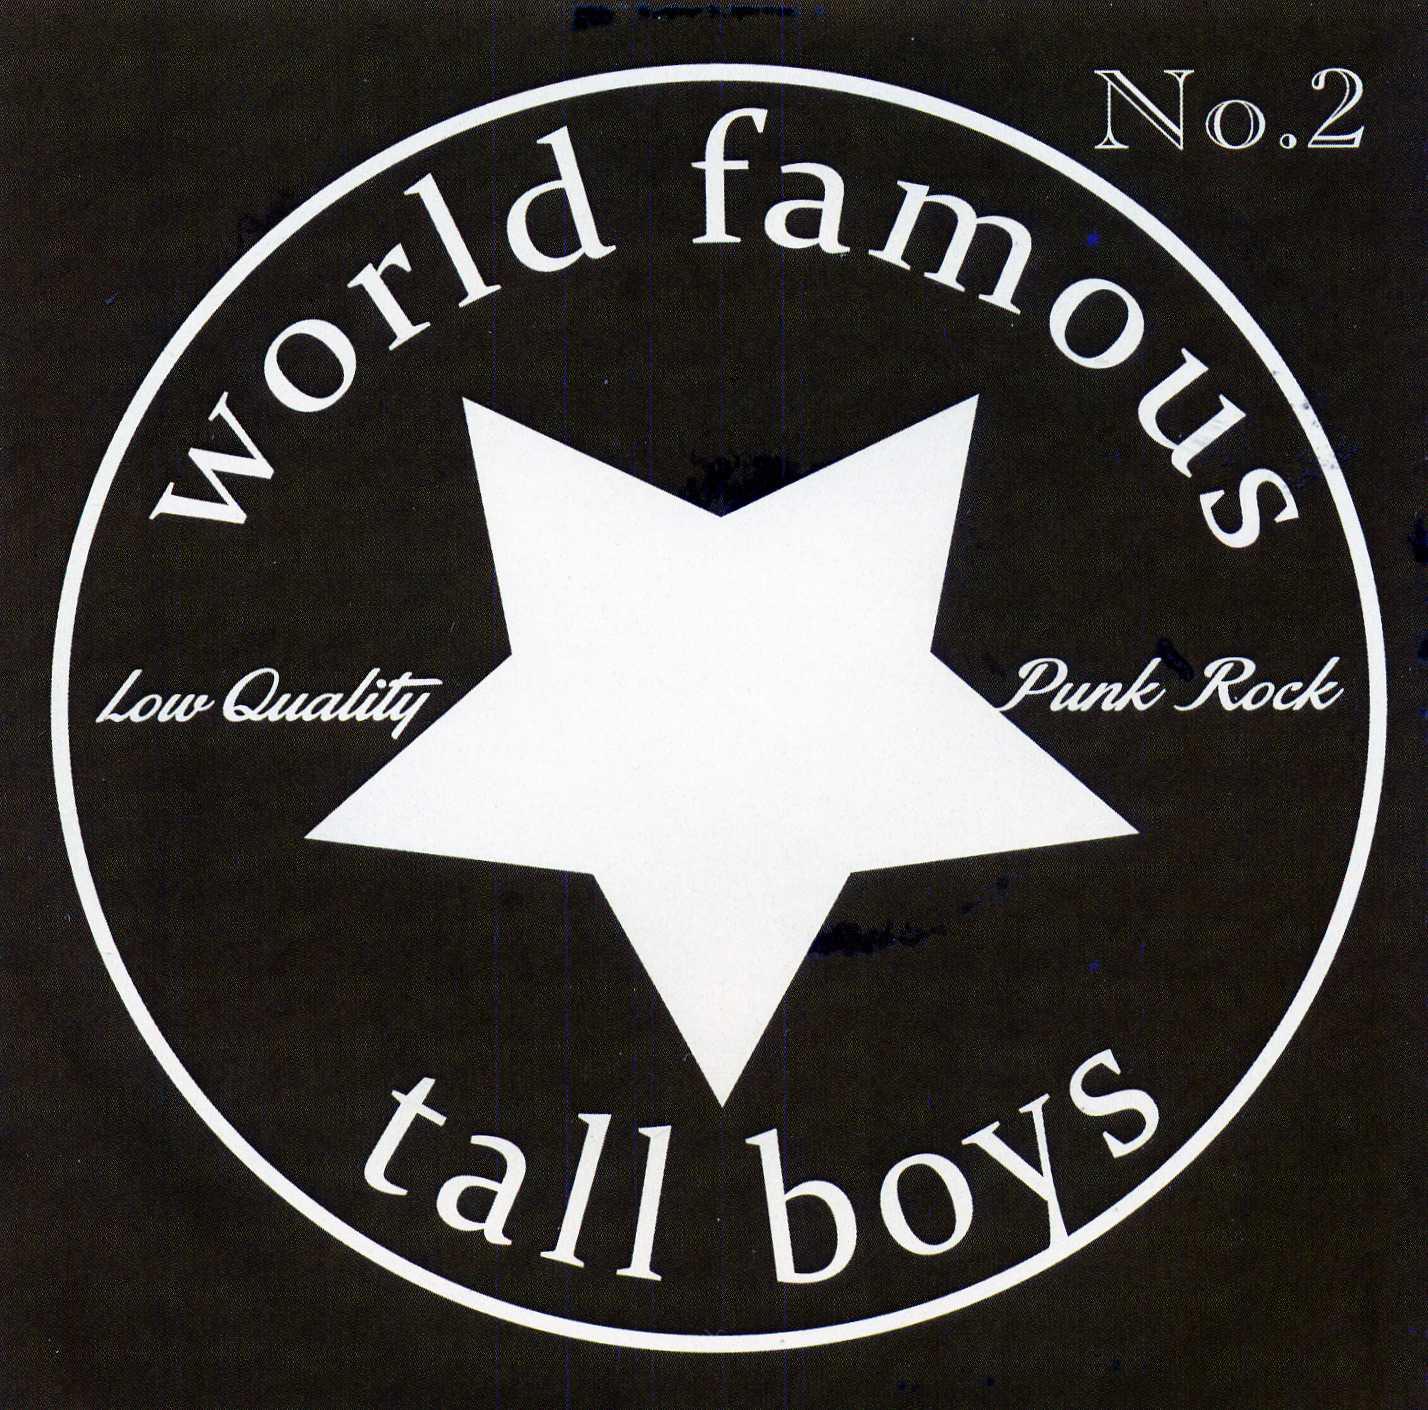 World Famous Tall Boys – No. 2